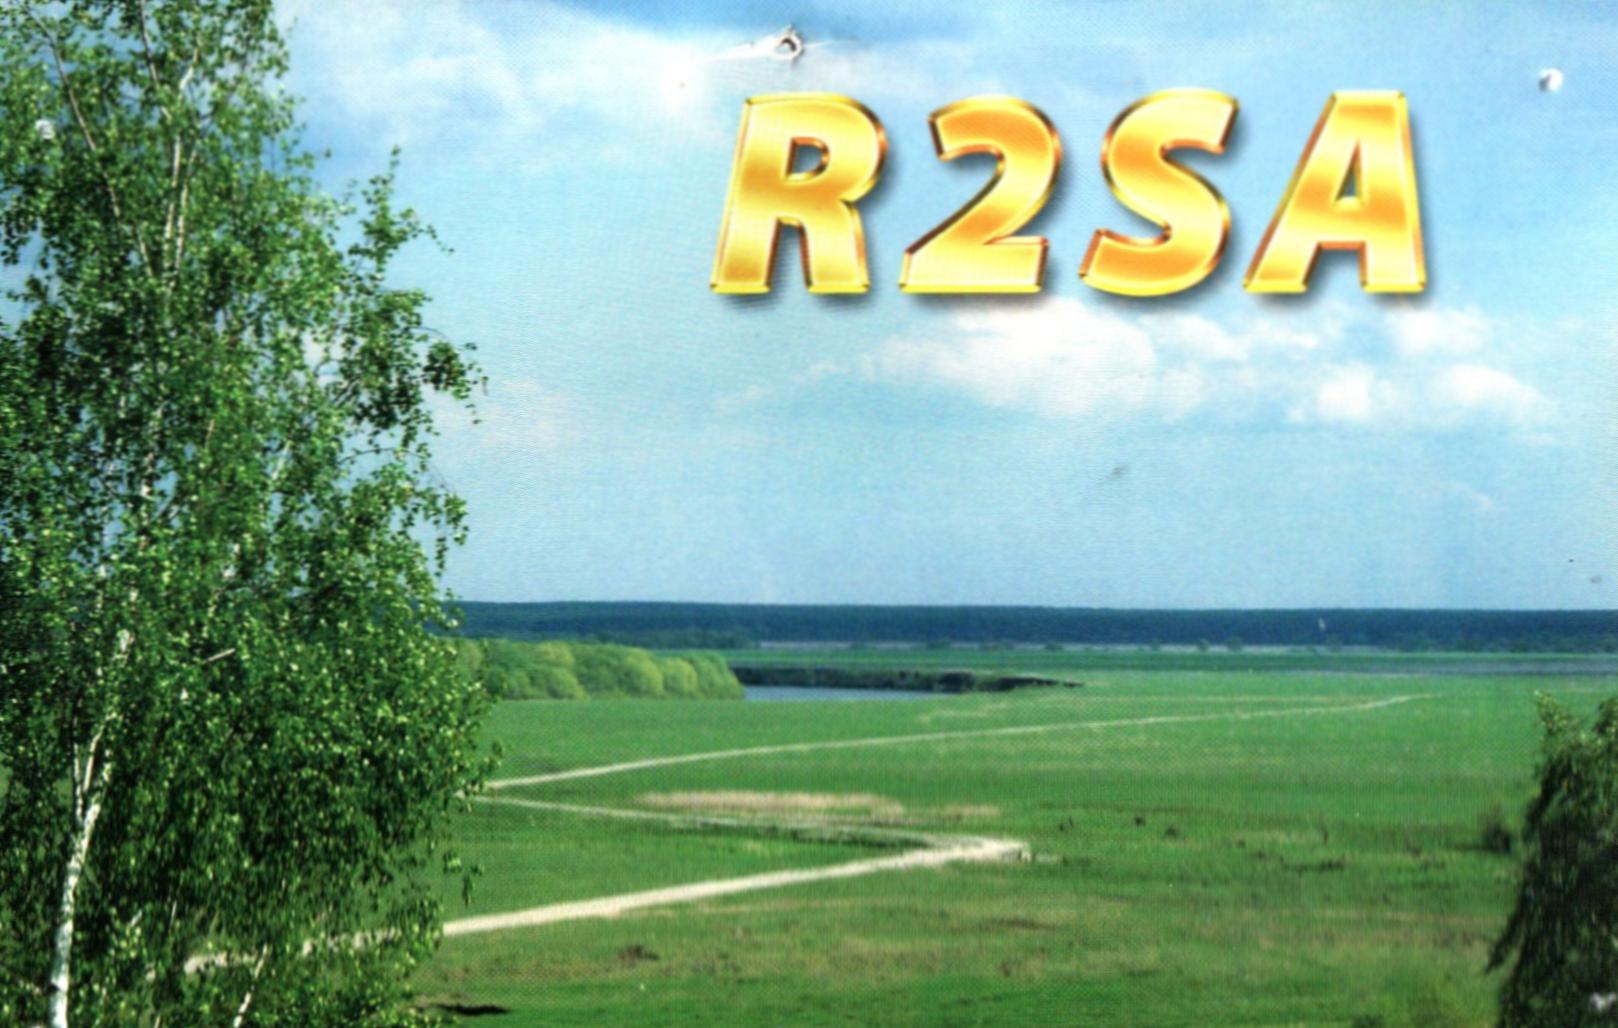 Нажмите на изображение для увеличения.  Название:R2SA-2017-1s.jpg Просмотров:5 Размер:183.7 Кб ID:220128